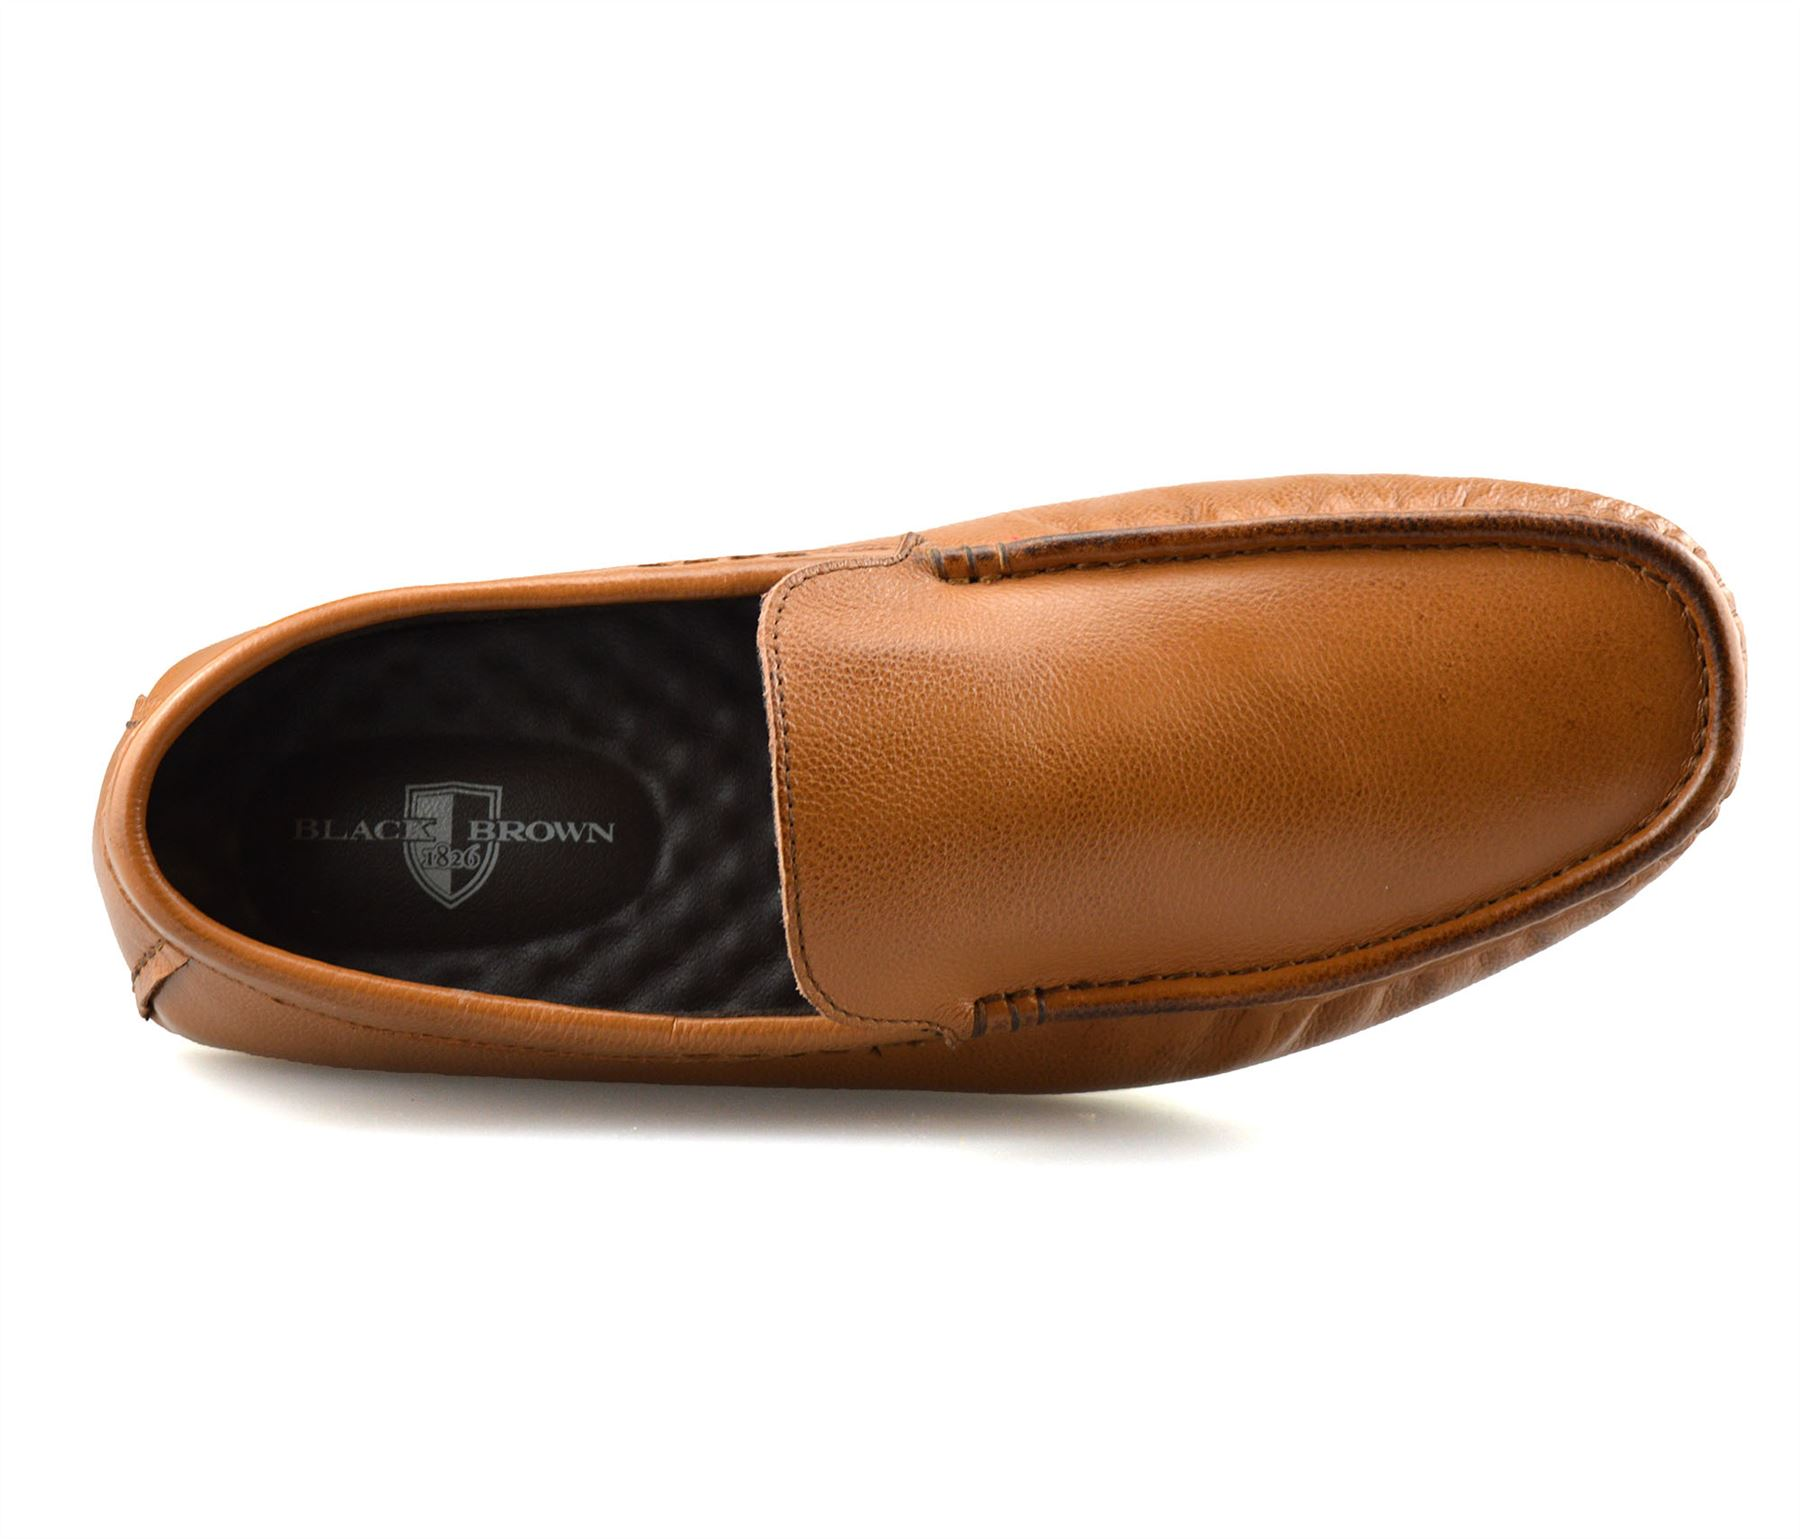 Homme-en-Cuir-Slip-On-Casual-Smart-Mocassins-Mocassin-Homme-Conduite-Chaussures-Taille miniature 14